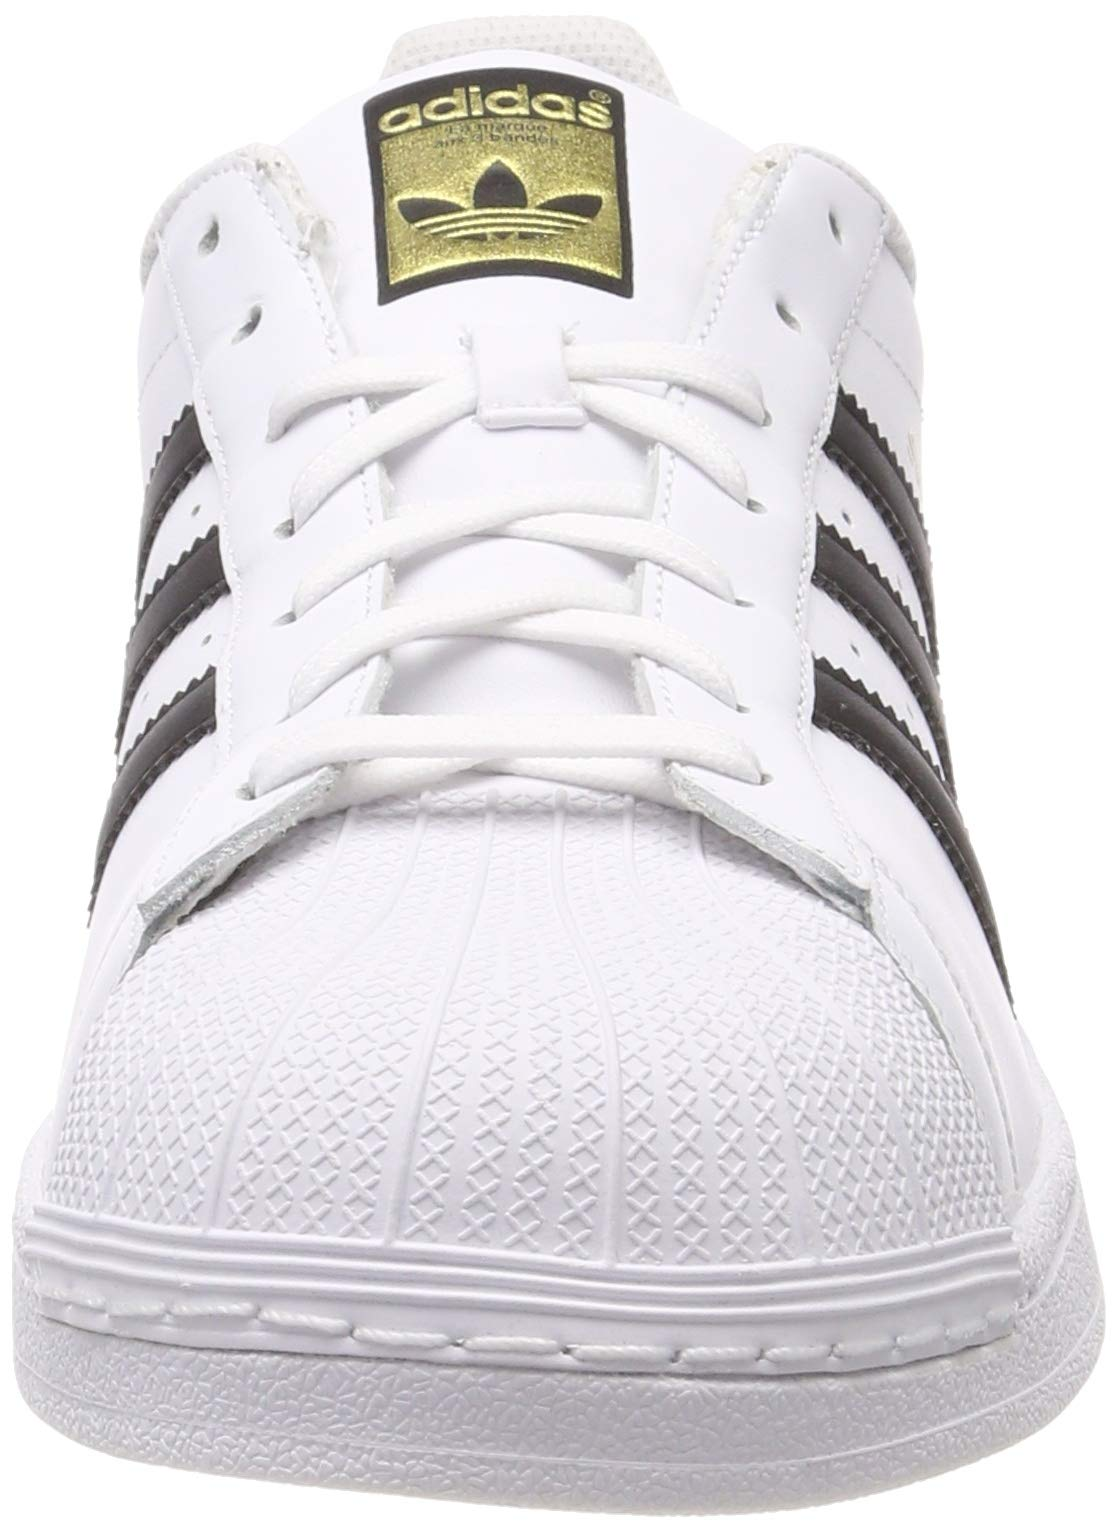 Adidas Originals Superstar Foundation Scarpe da Ginnastica Unisex - Adulto 4 spesavip